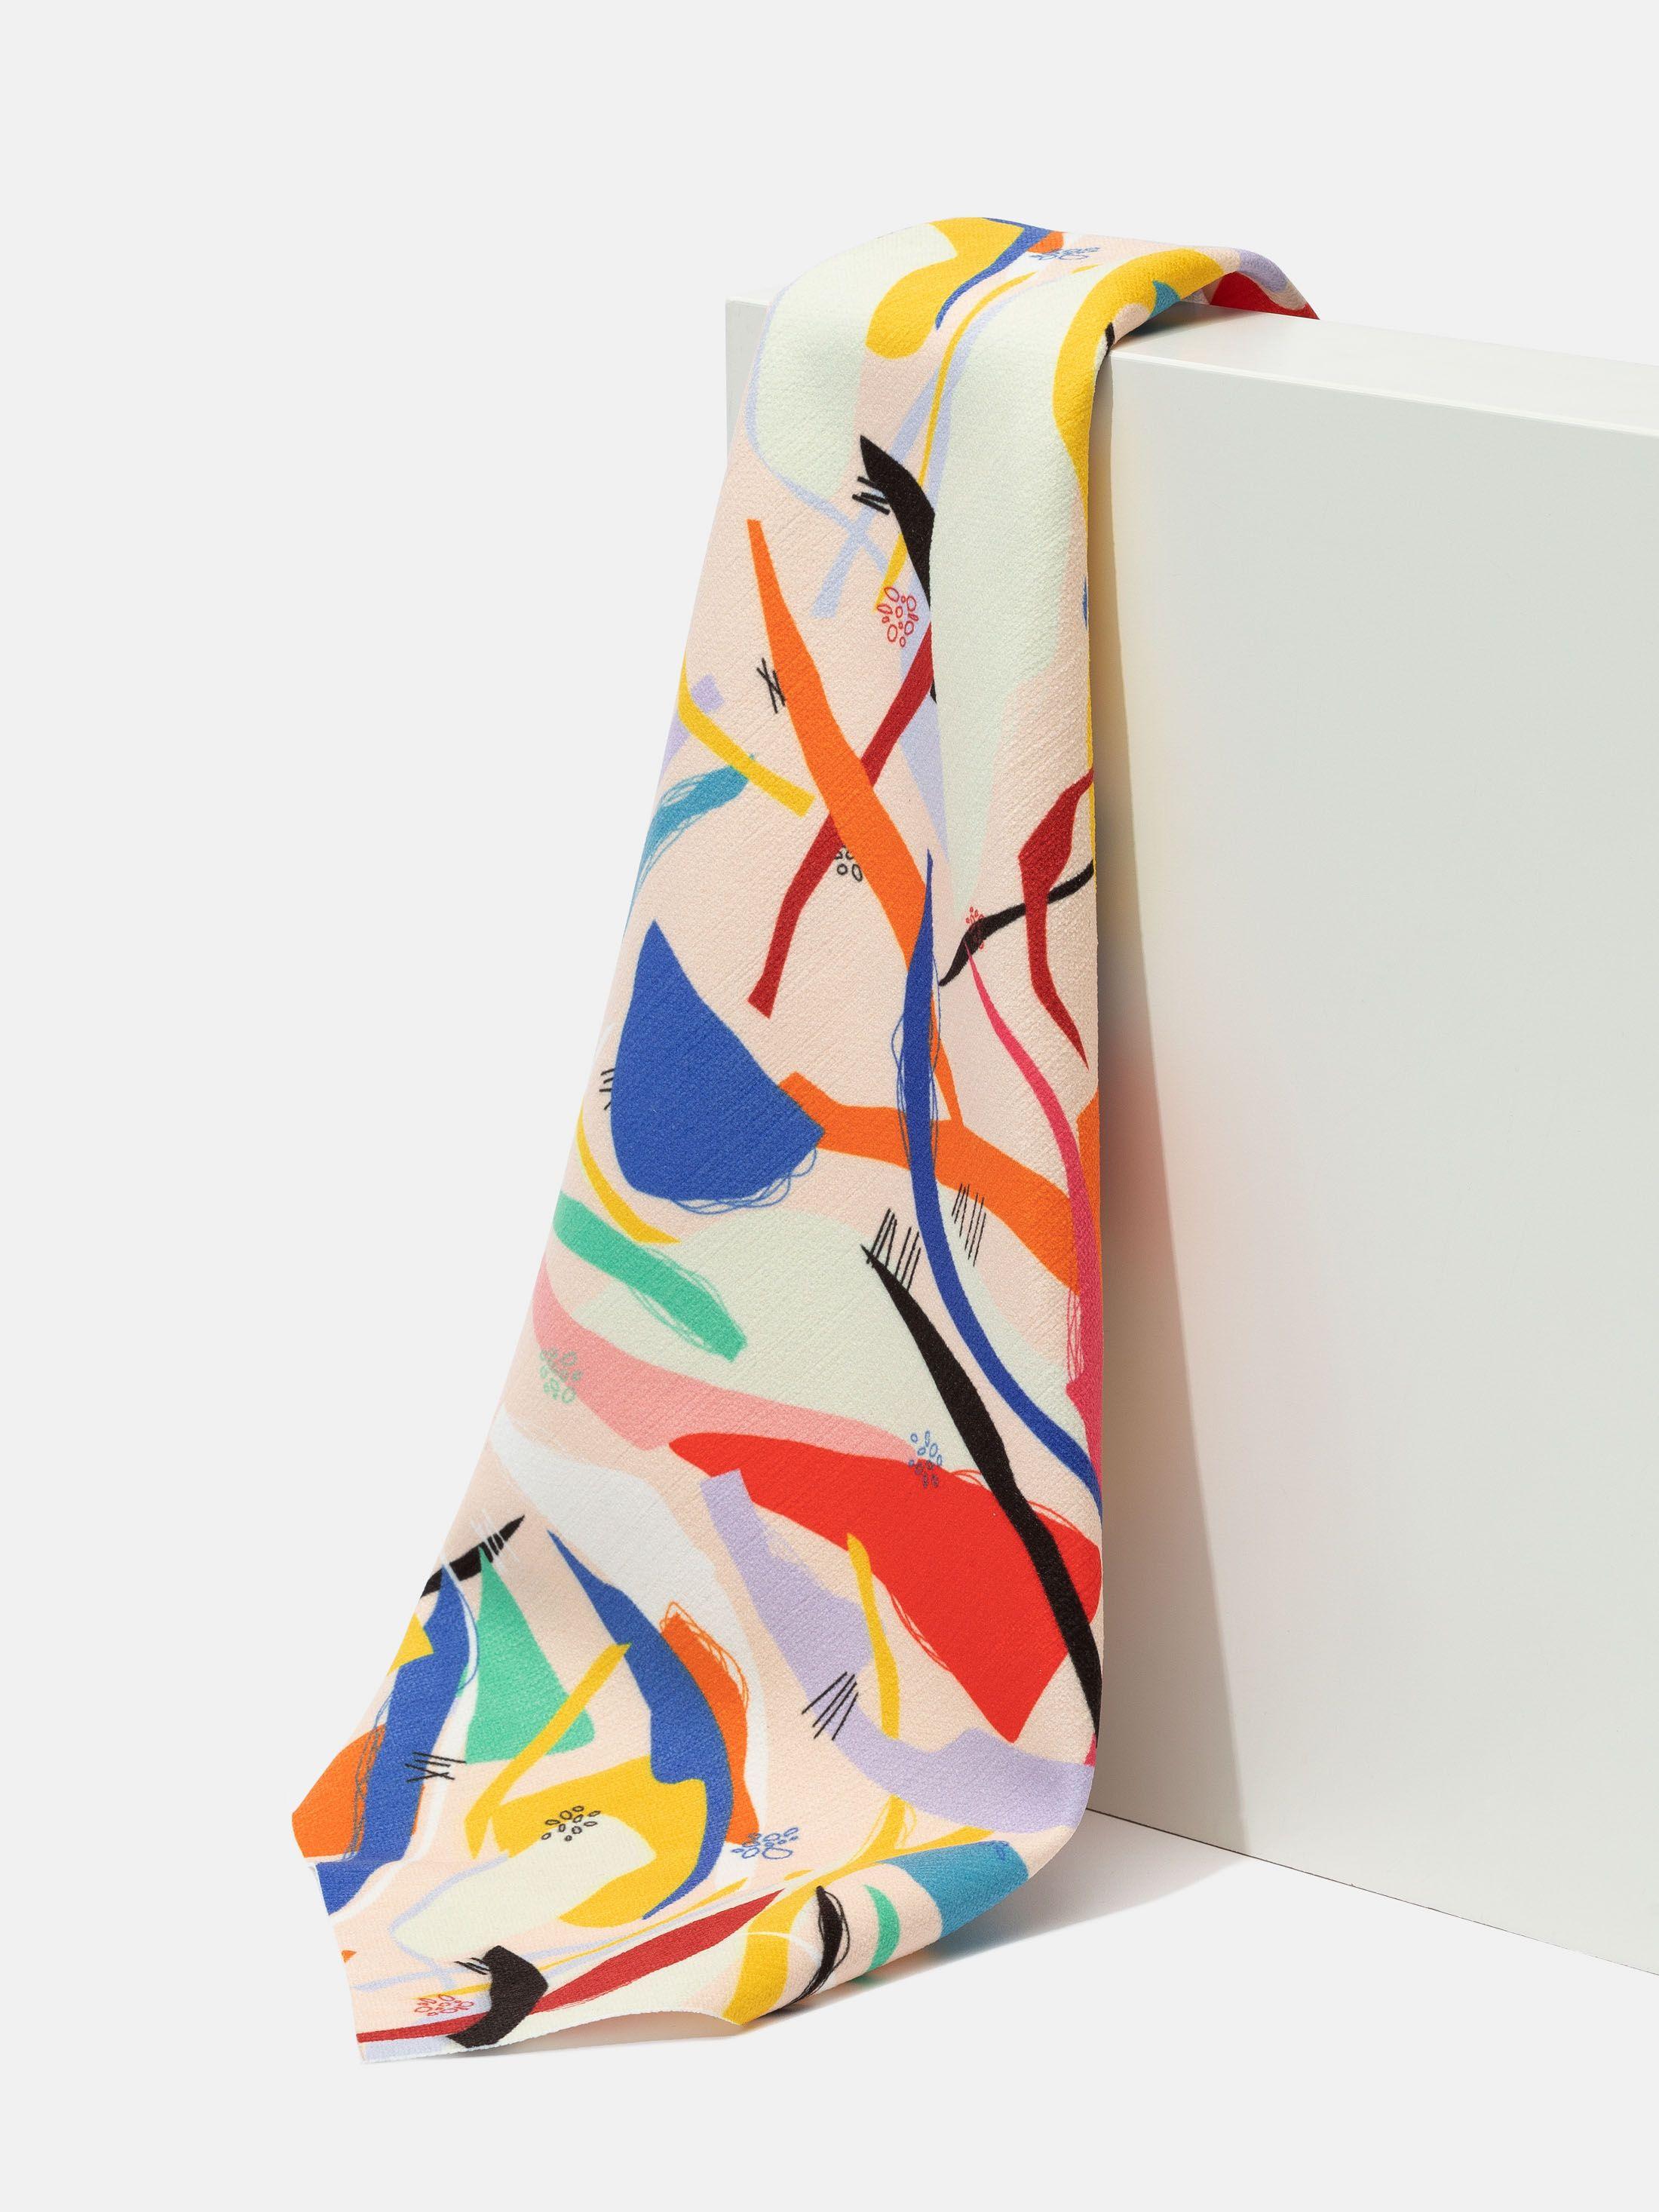 digital printing on Chenille fabric